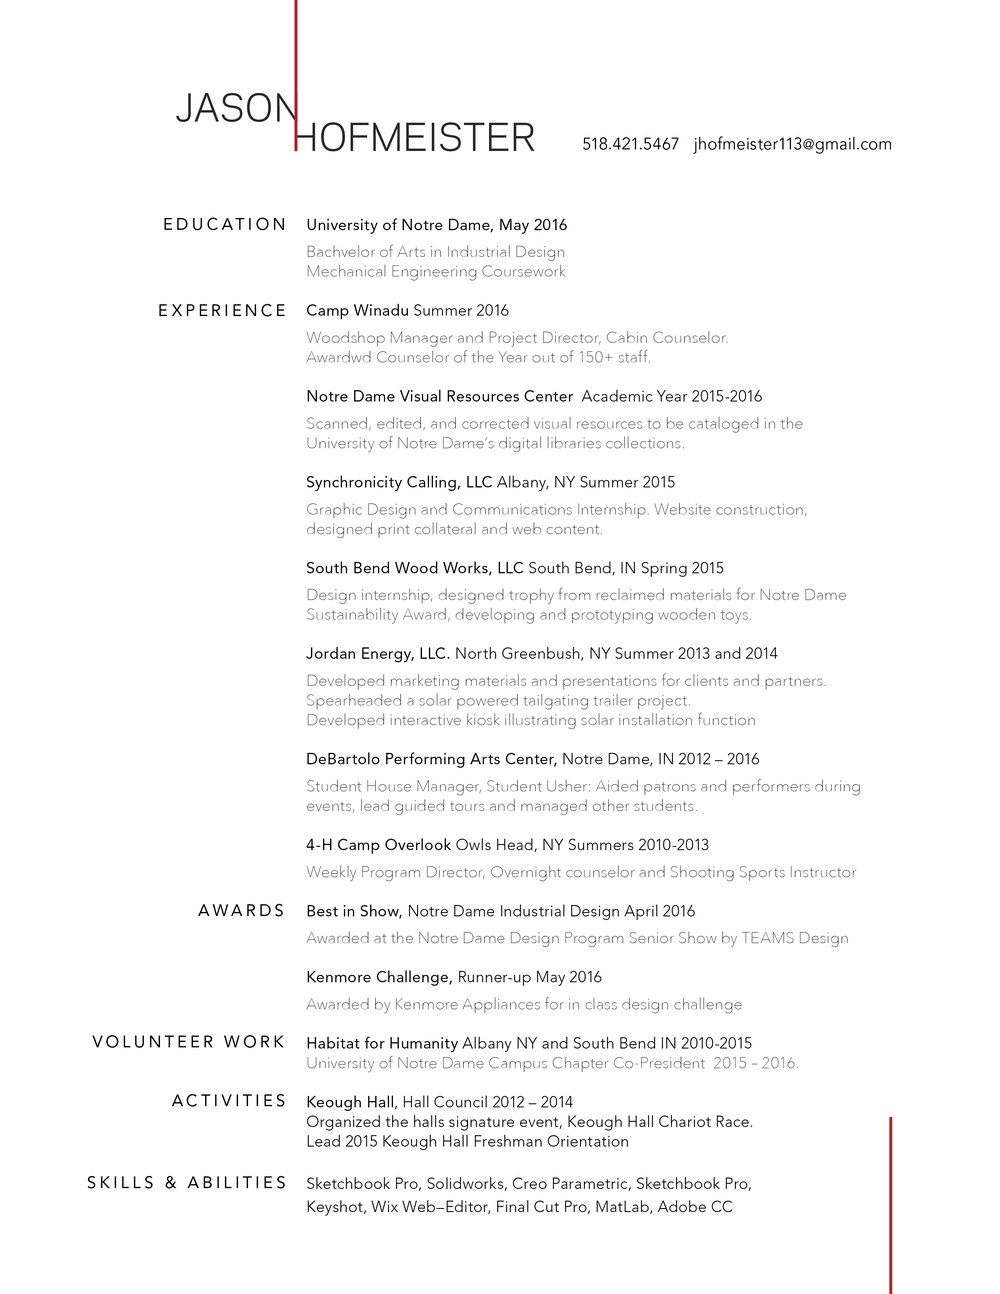 resume jason hofmeister design portfolio